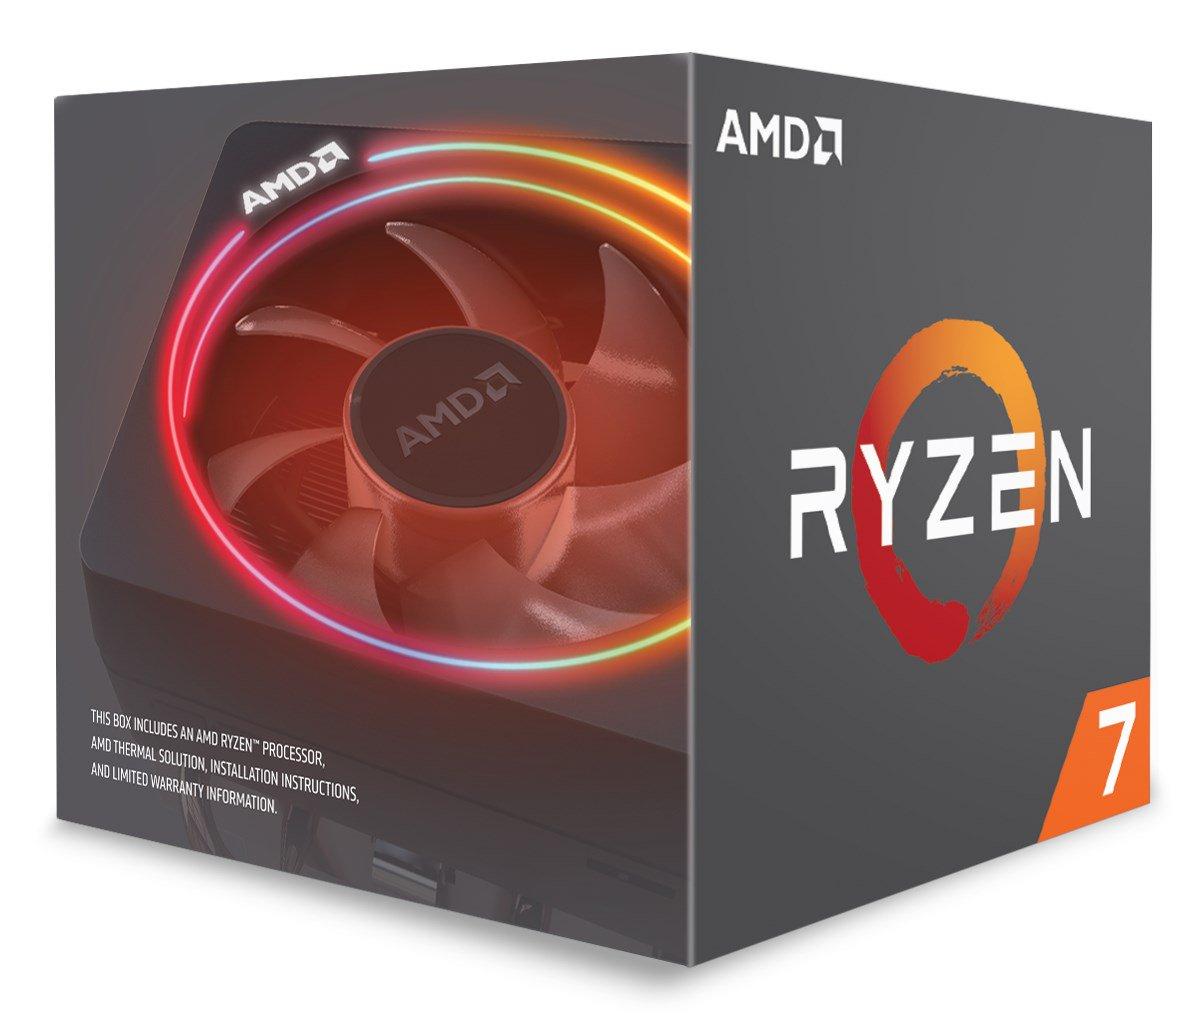 Ryzen 2700x CPU Cheapest pre-order I've seen £279.99 @ CCLOnline